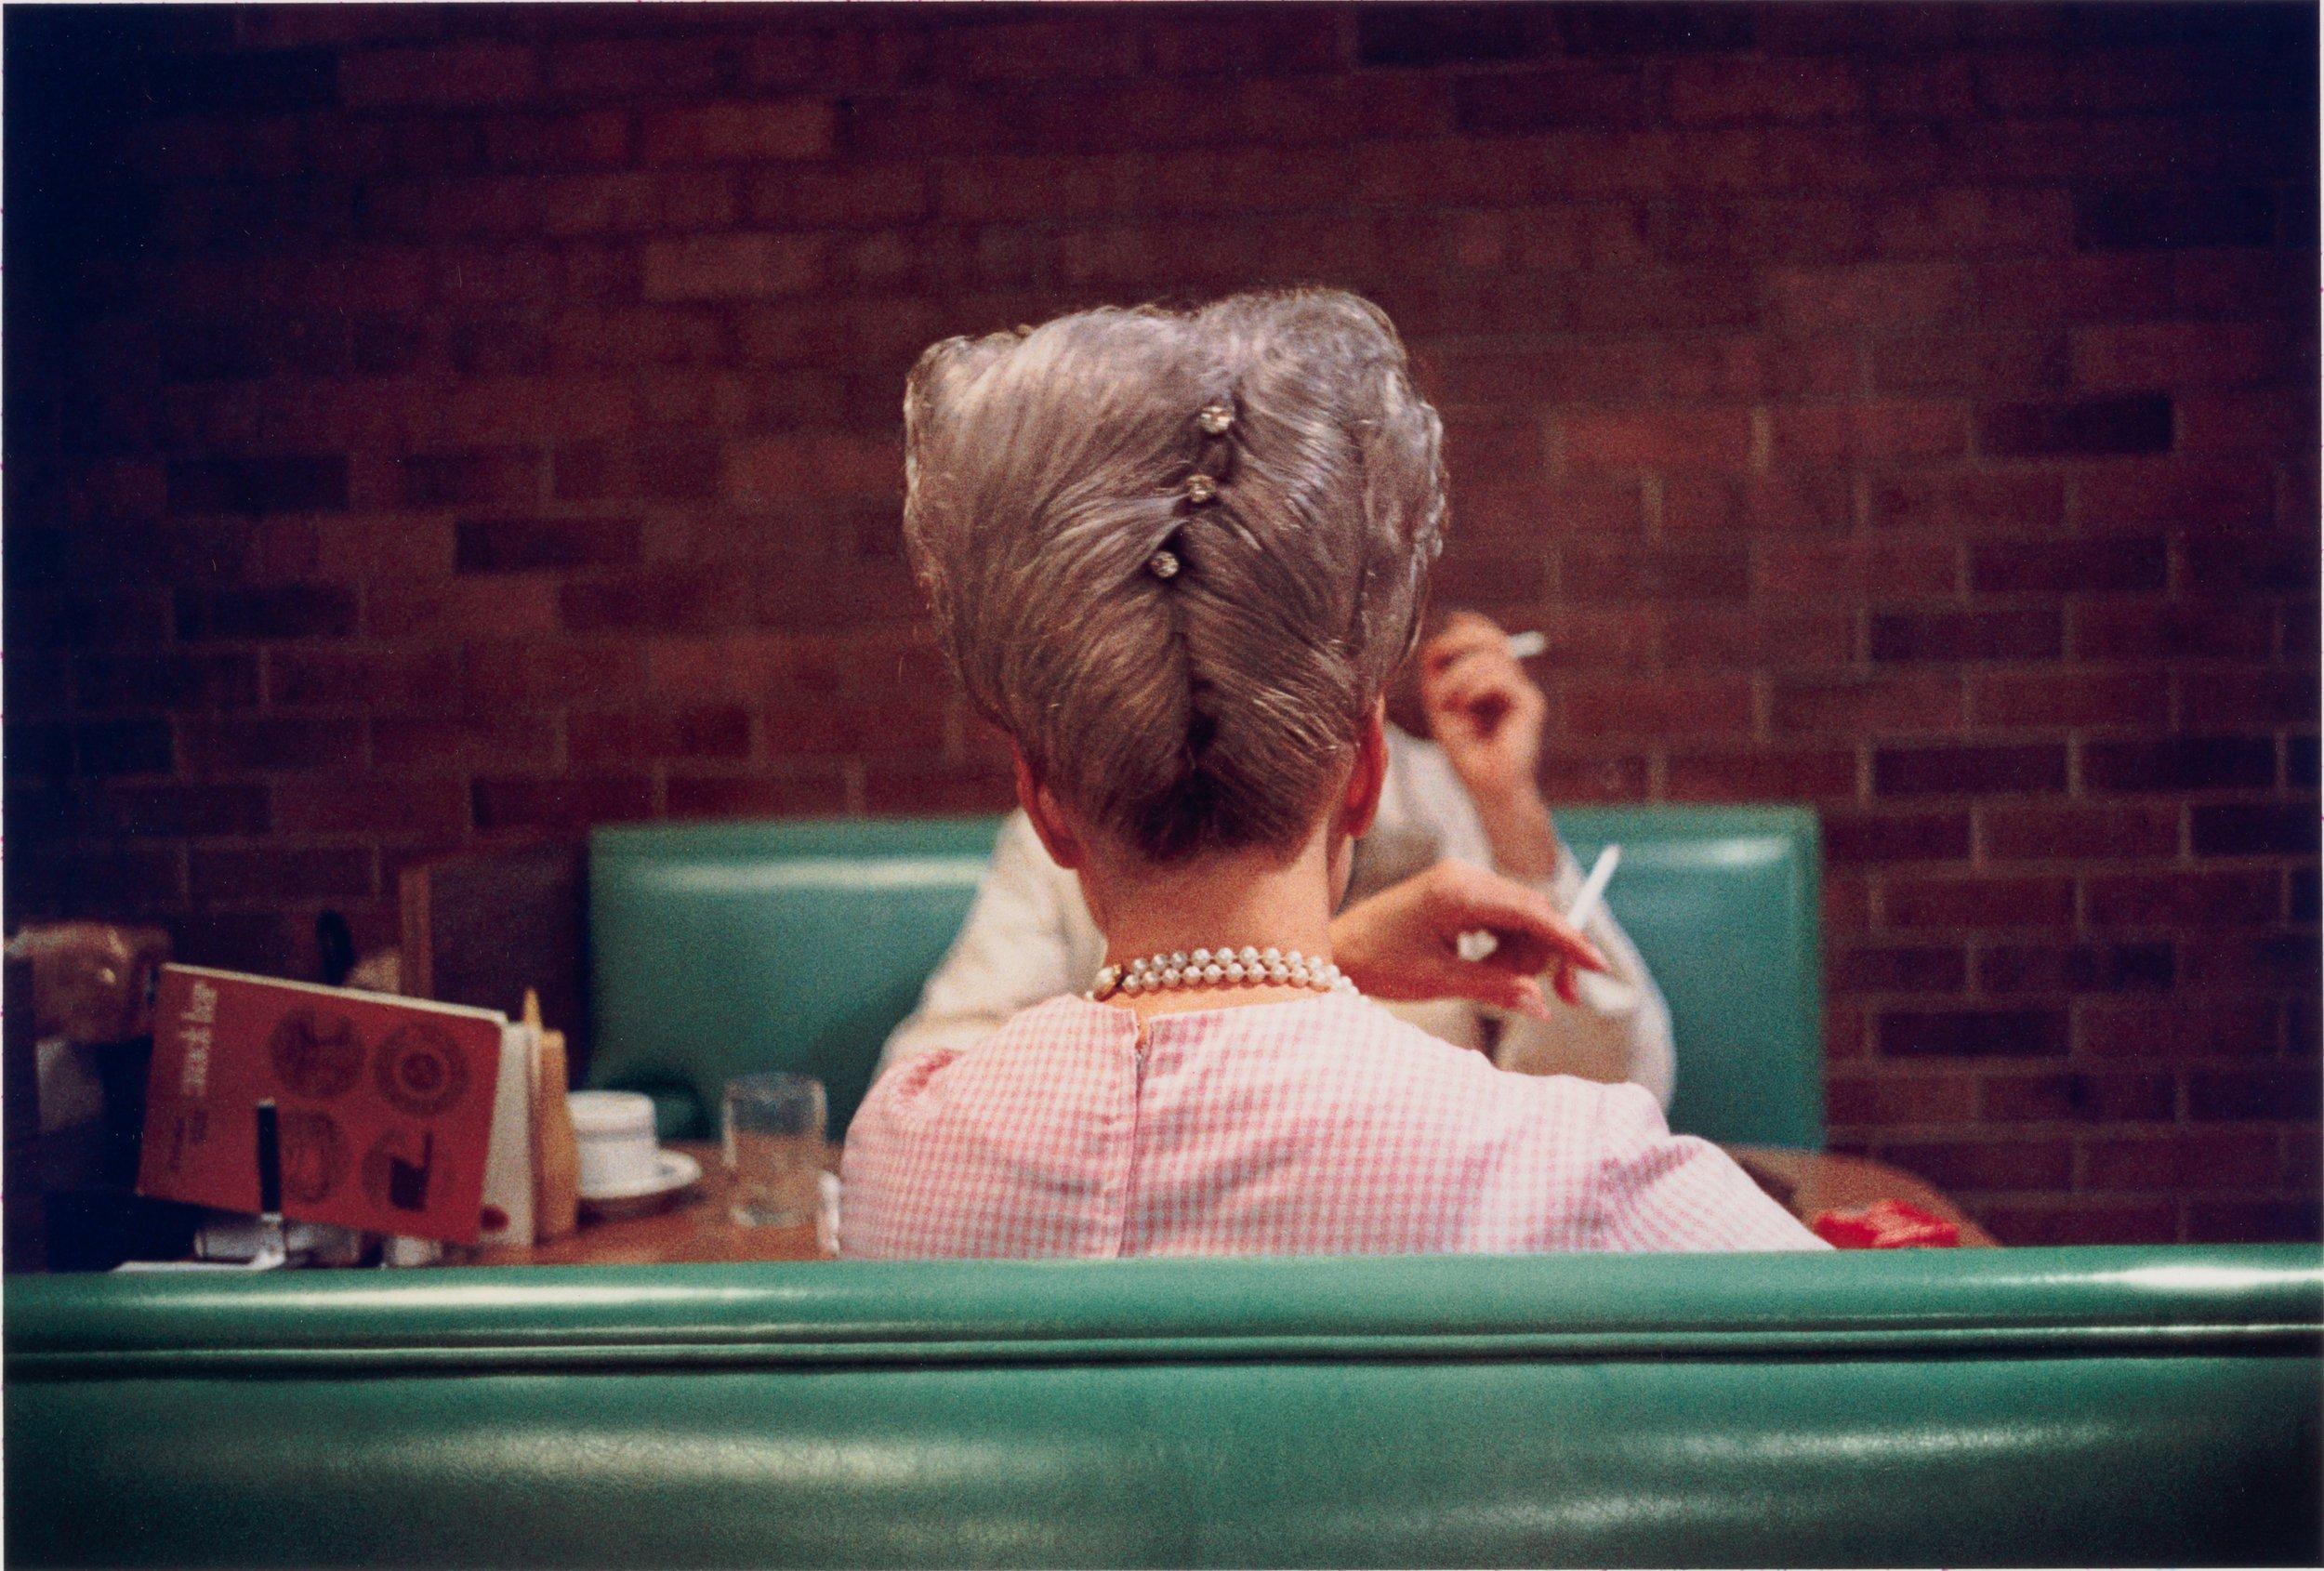 William Eggleston,  Memphis, 1965-68 , Dye-transfer print, The Metropolitan Museum of Art, New York, Promised Gift of Jade Lau © Eggleston Artistic Trust. Courtesy David Zwirner, New York/London/Hong Kong